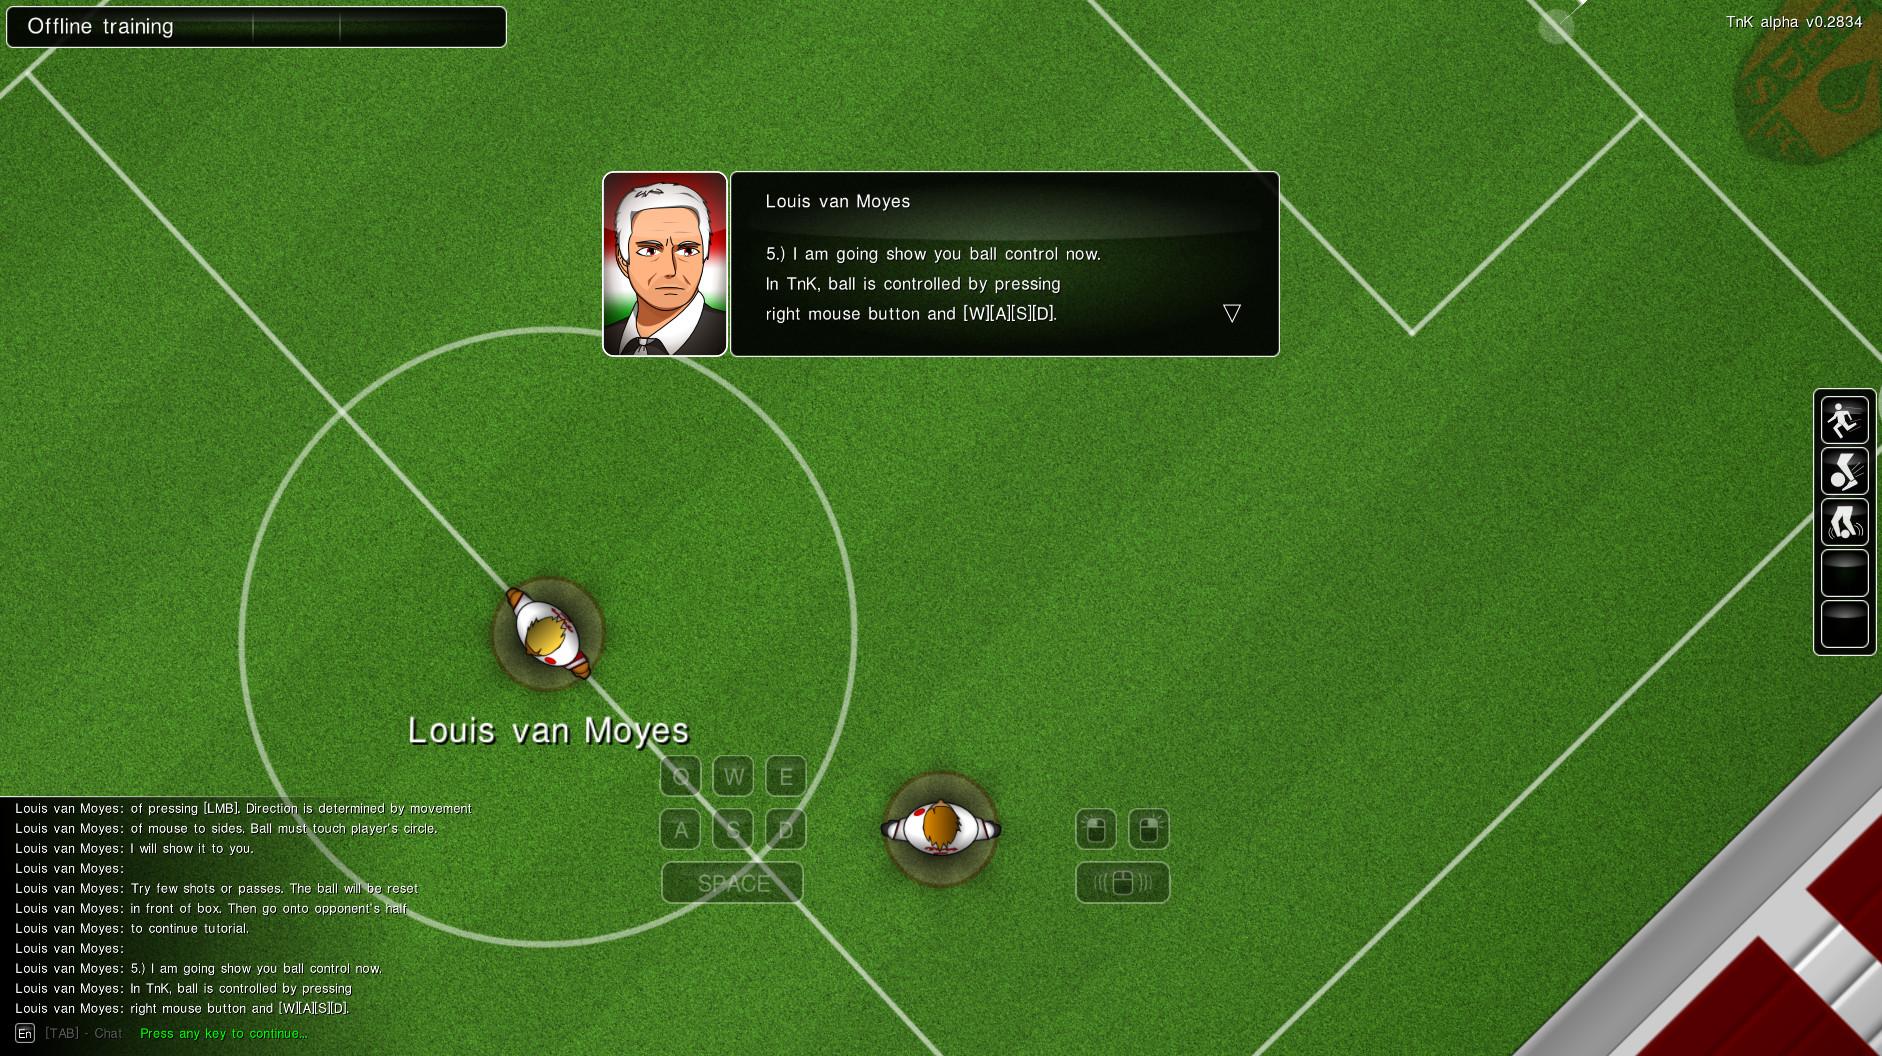 Tutorial - Npc explains ball control.